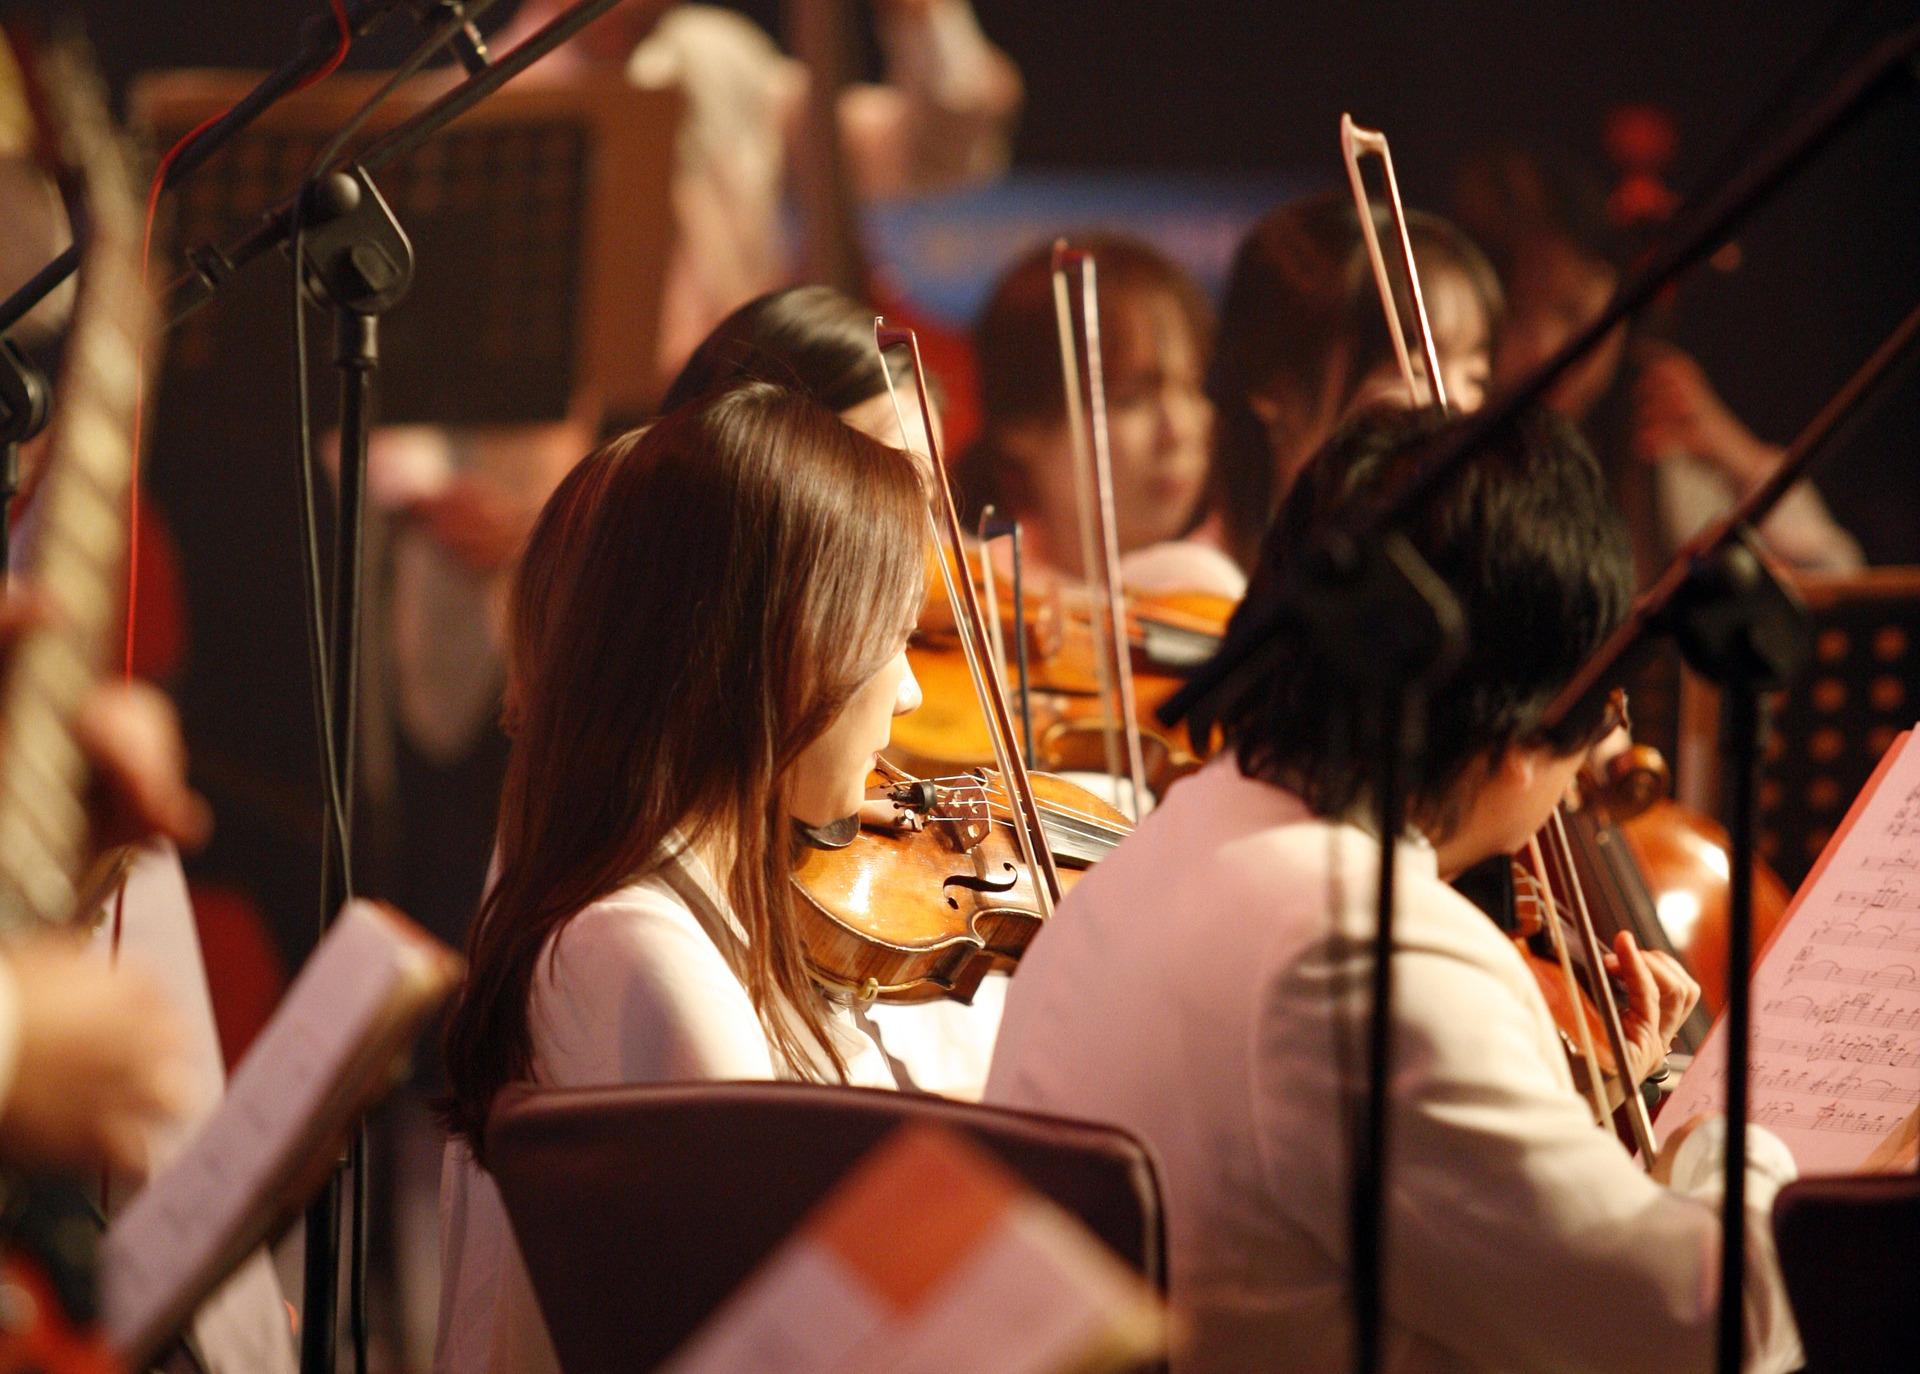 orchestra-2496505_1920.jpg